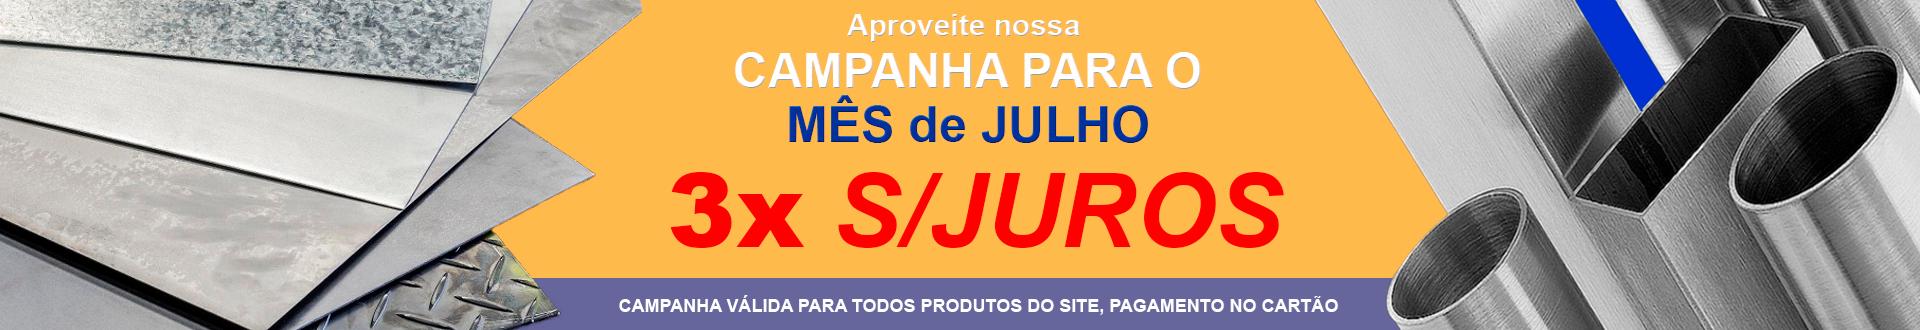 2019-07-01-banner-1920x330-fundo-laranja---desconto-CAMPANHA-JULHO-3-X-SEM-JUROS